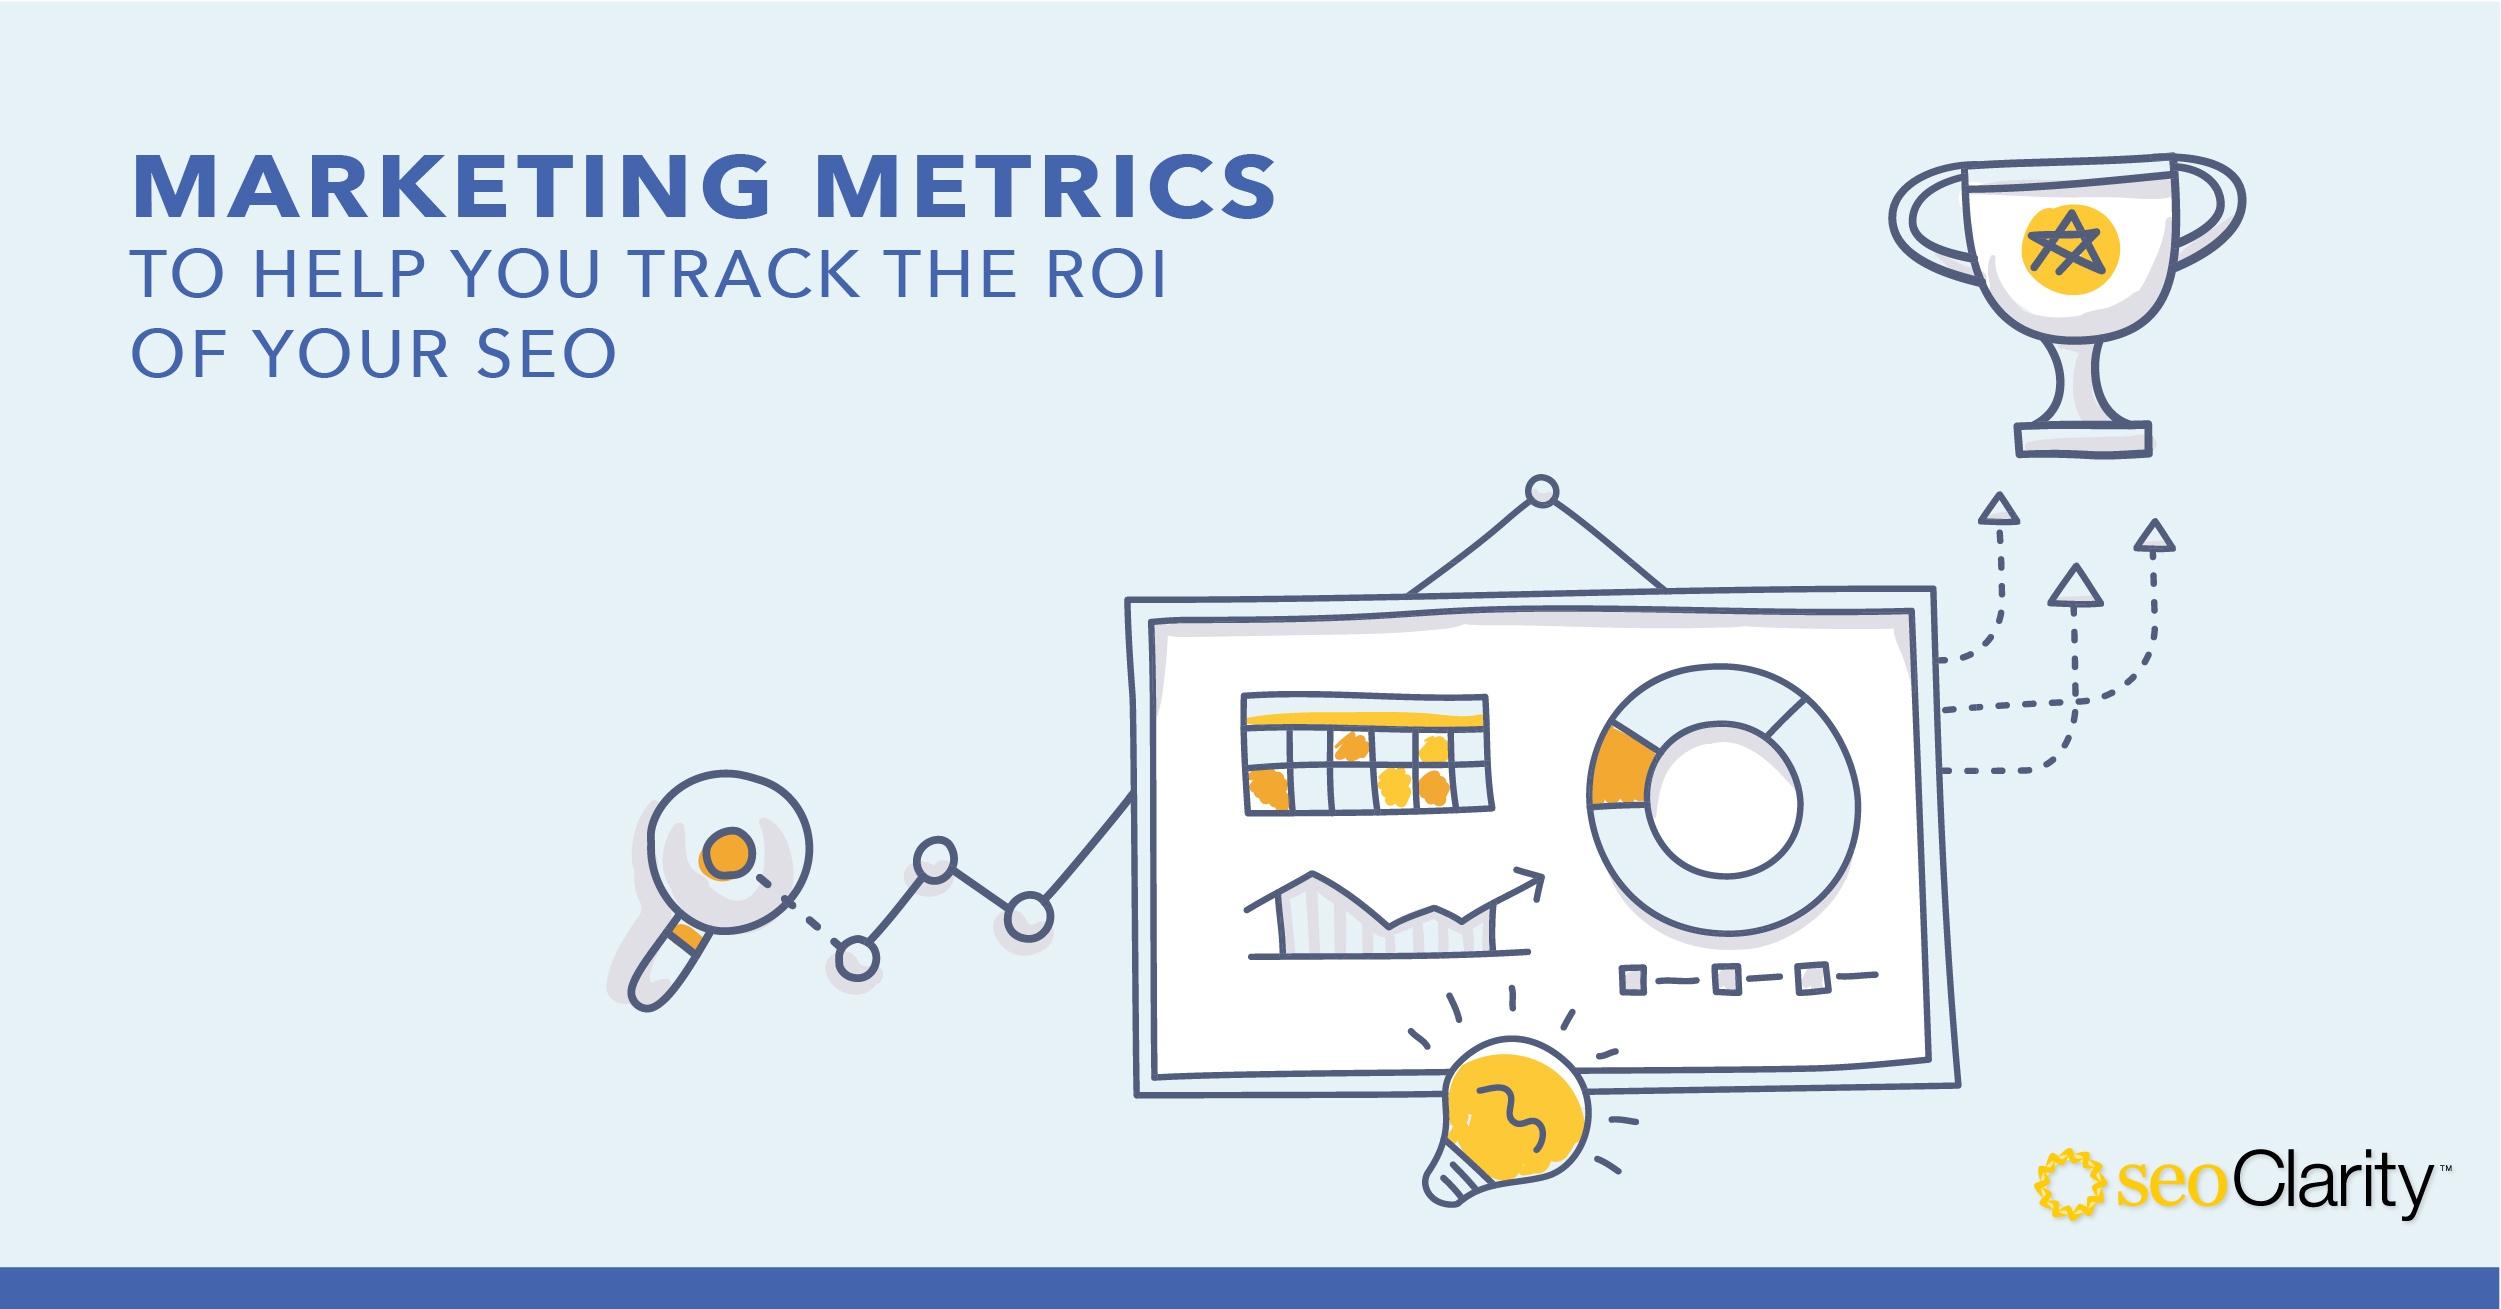 What Marketing Metrics Help You Track ROI of SEO